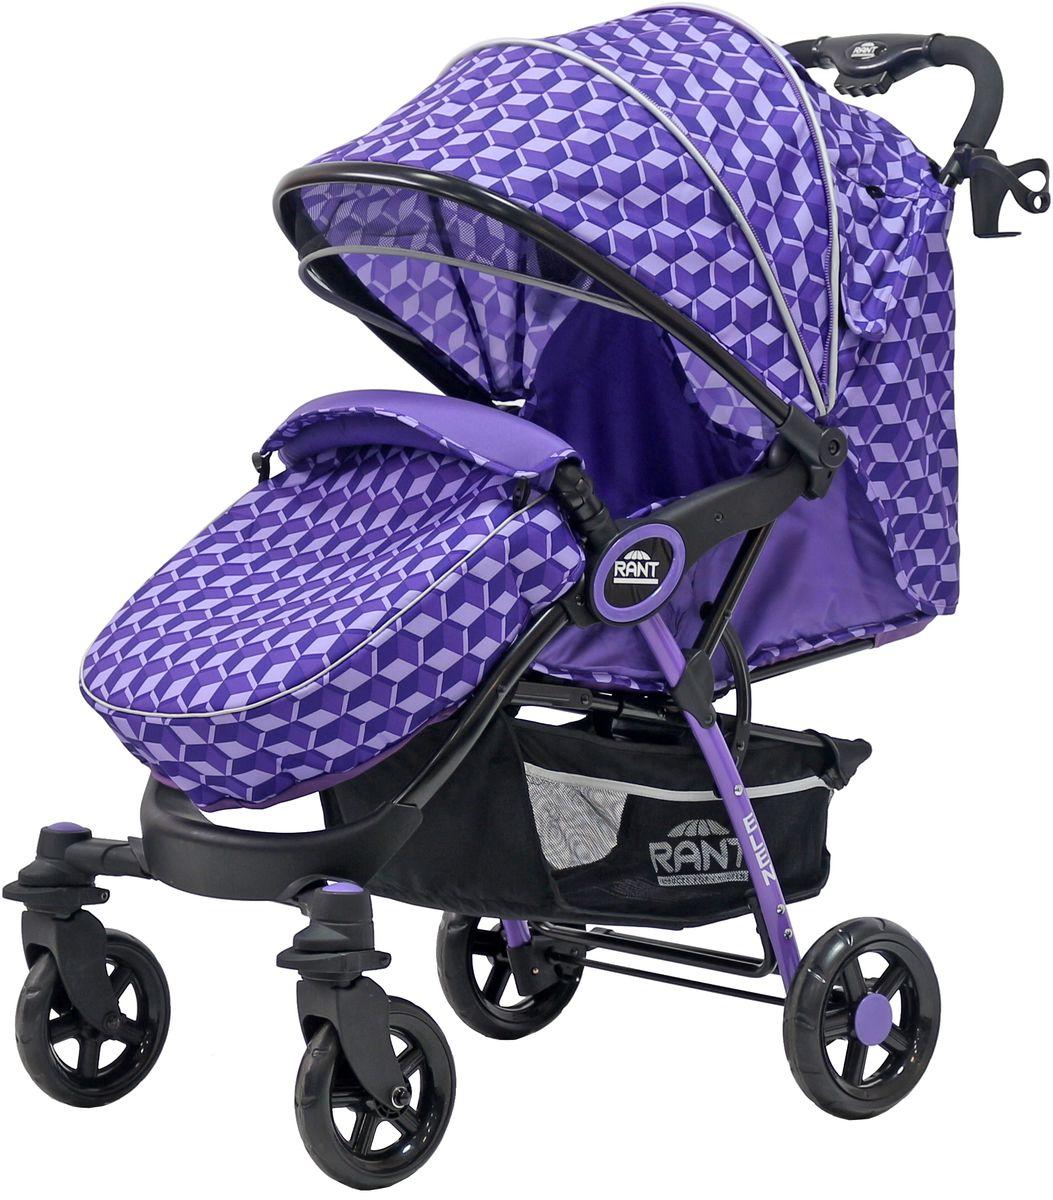 Rant Коляска прогулочная Elen цвет 3D фиолетовый